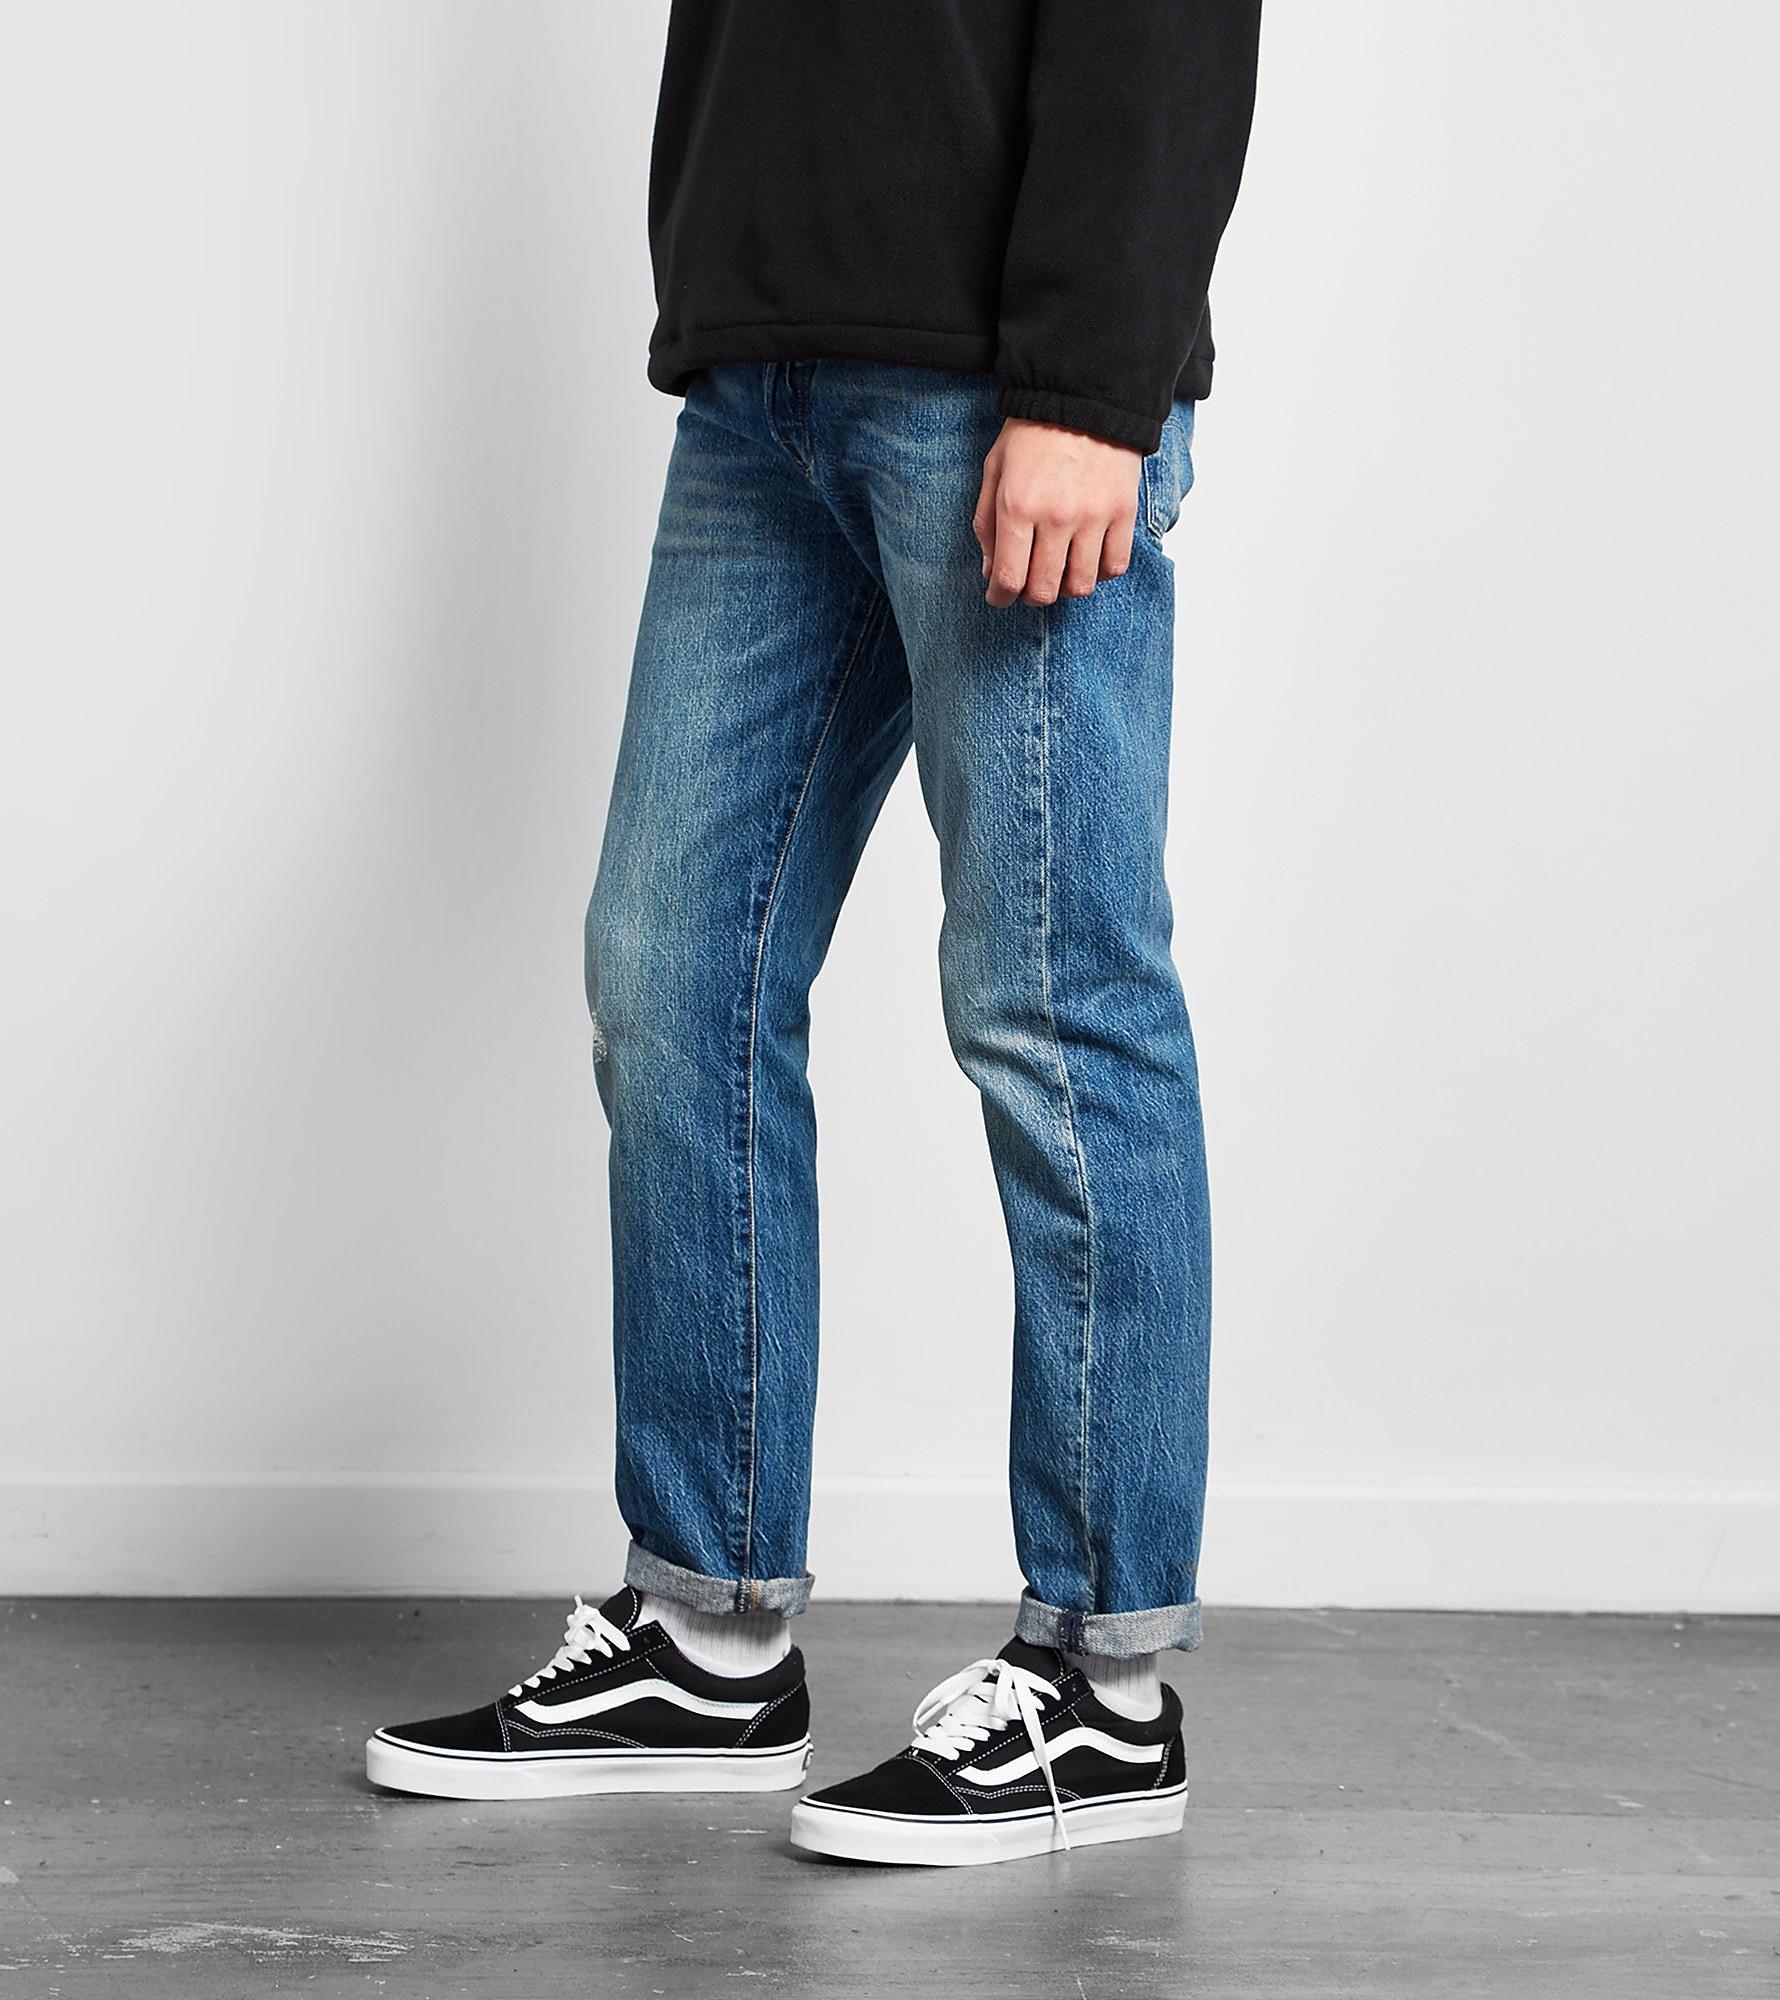 Levis 501 Tapered Spirit Jeans